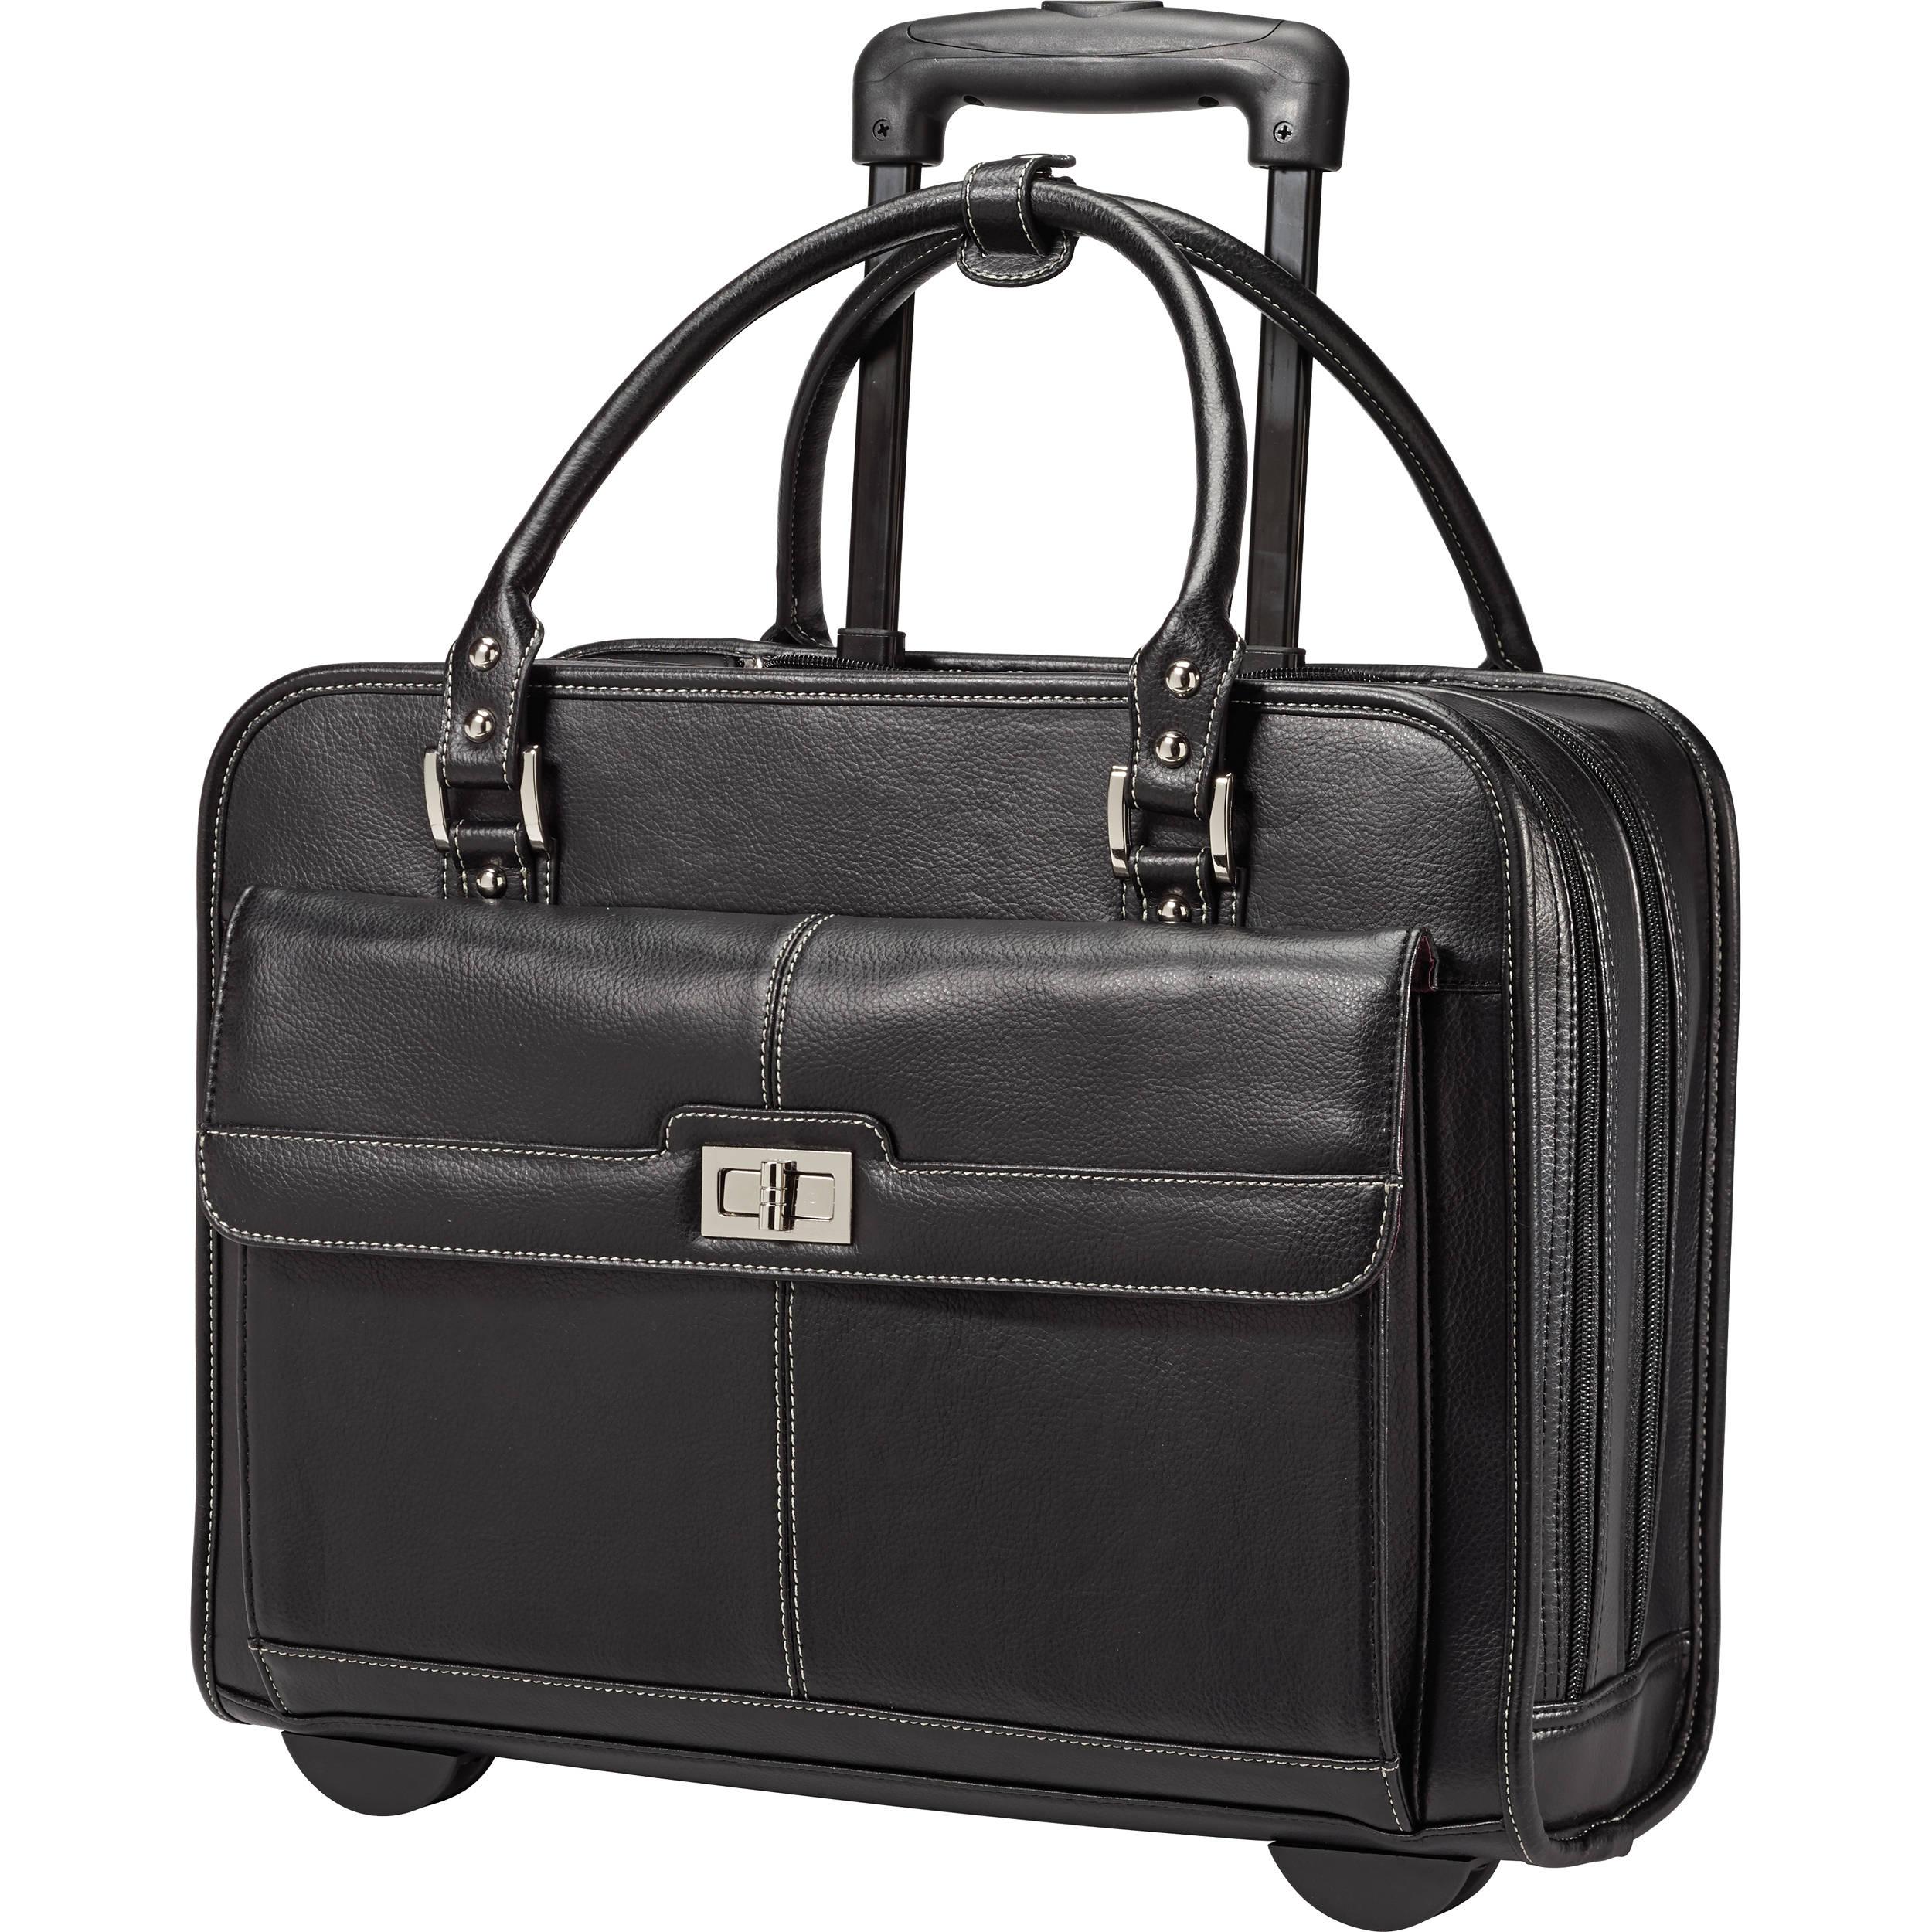 Mobile Office Bag Black 56733 1041